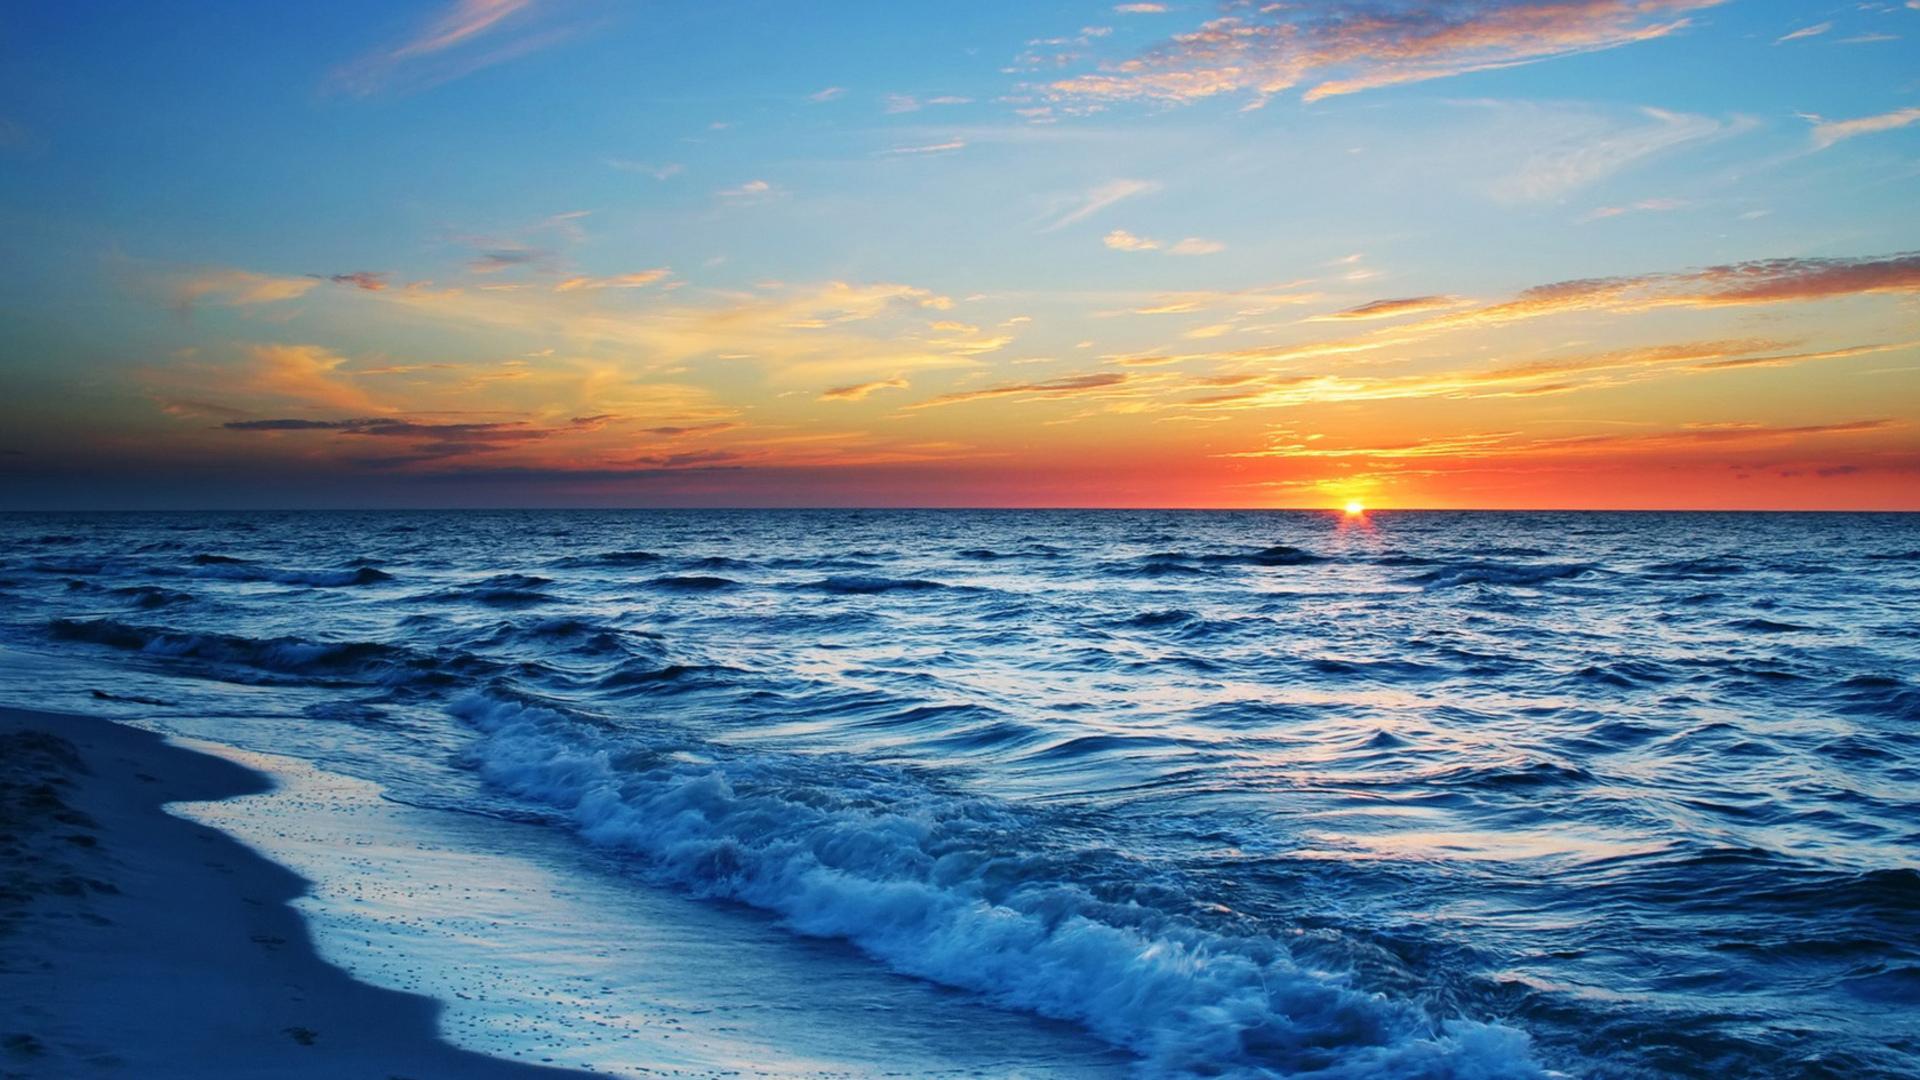 ... Ocean Sunset #862746 Ocean Sunset #862760 Ocean Sunset Wallpaper